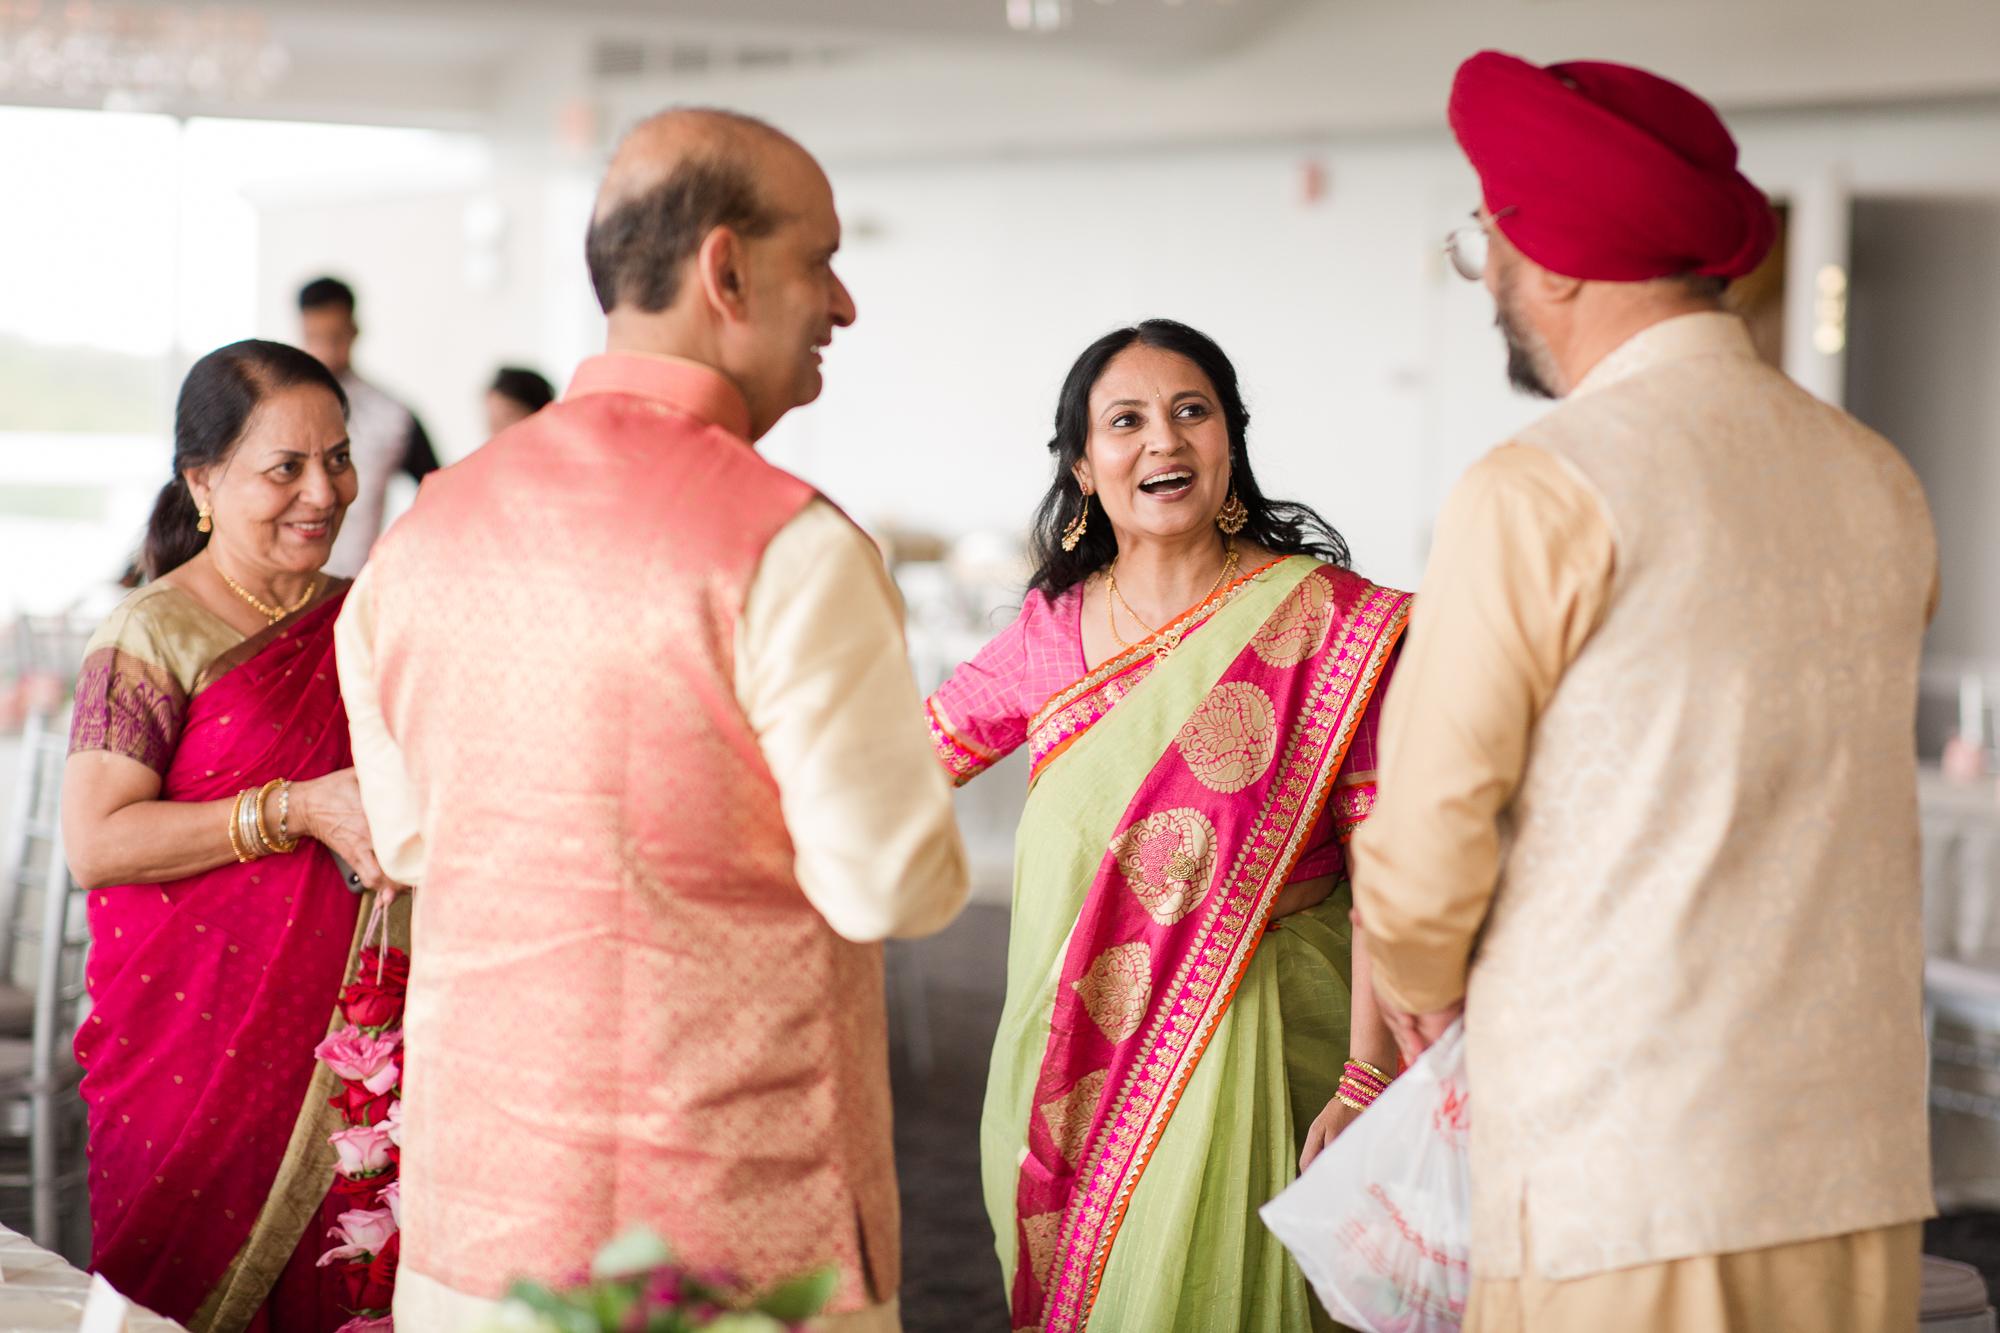 anumeet and gopika, indian engagement ring ceremony, top of the town, alexandria, northern virginia, nova weddings-3.jpg